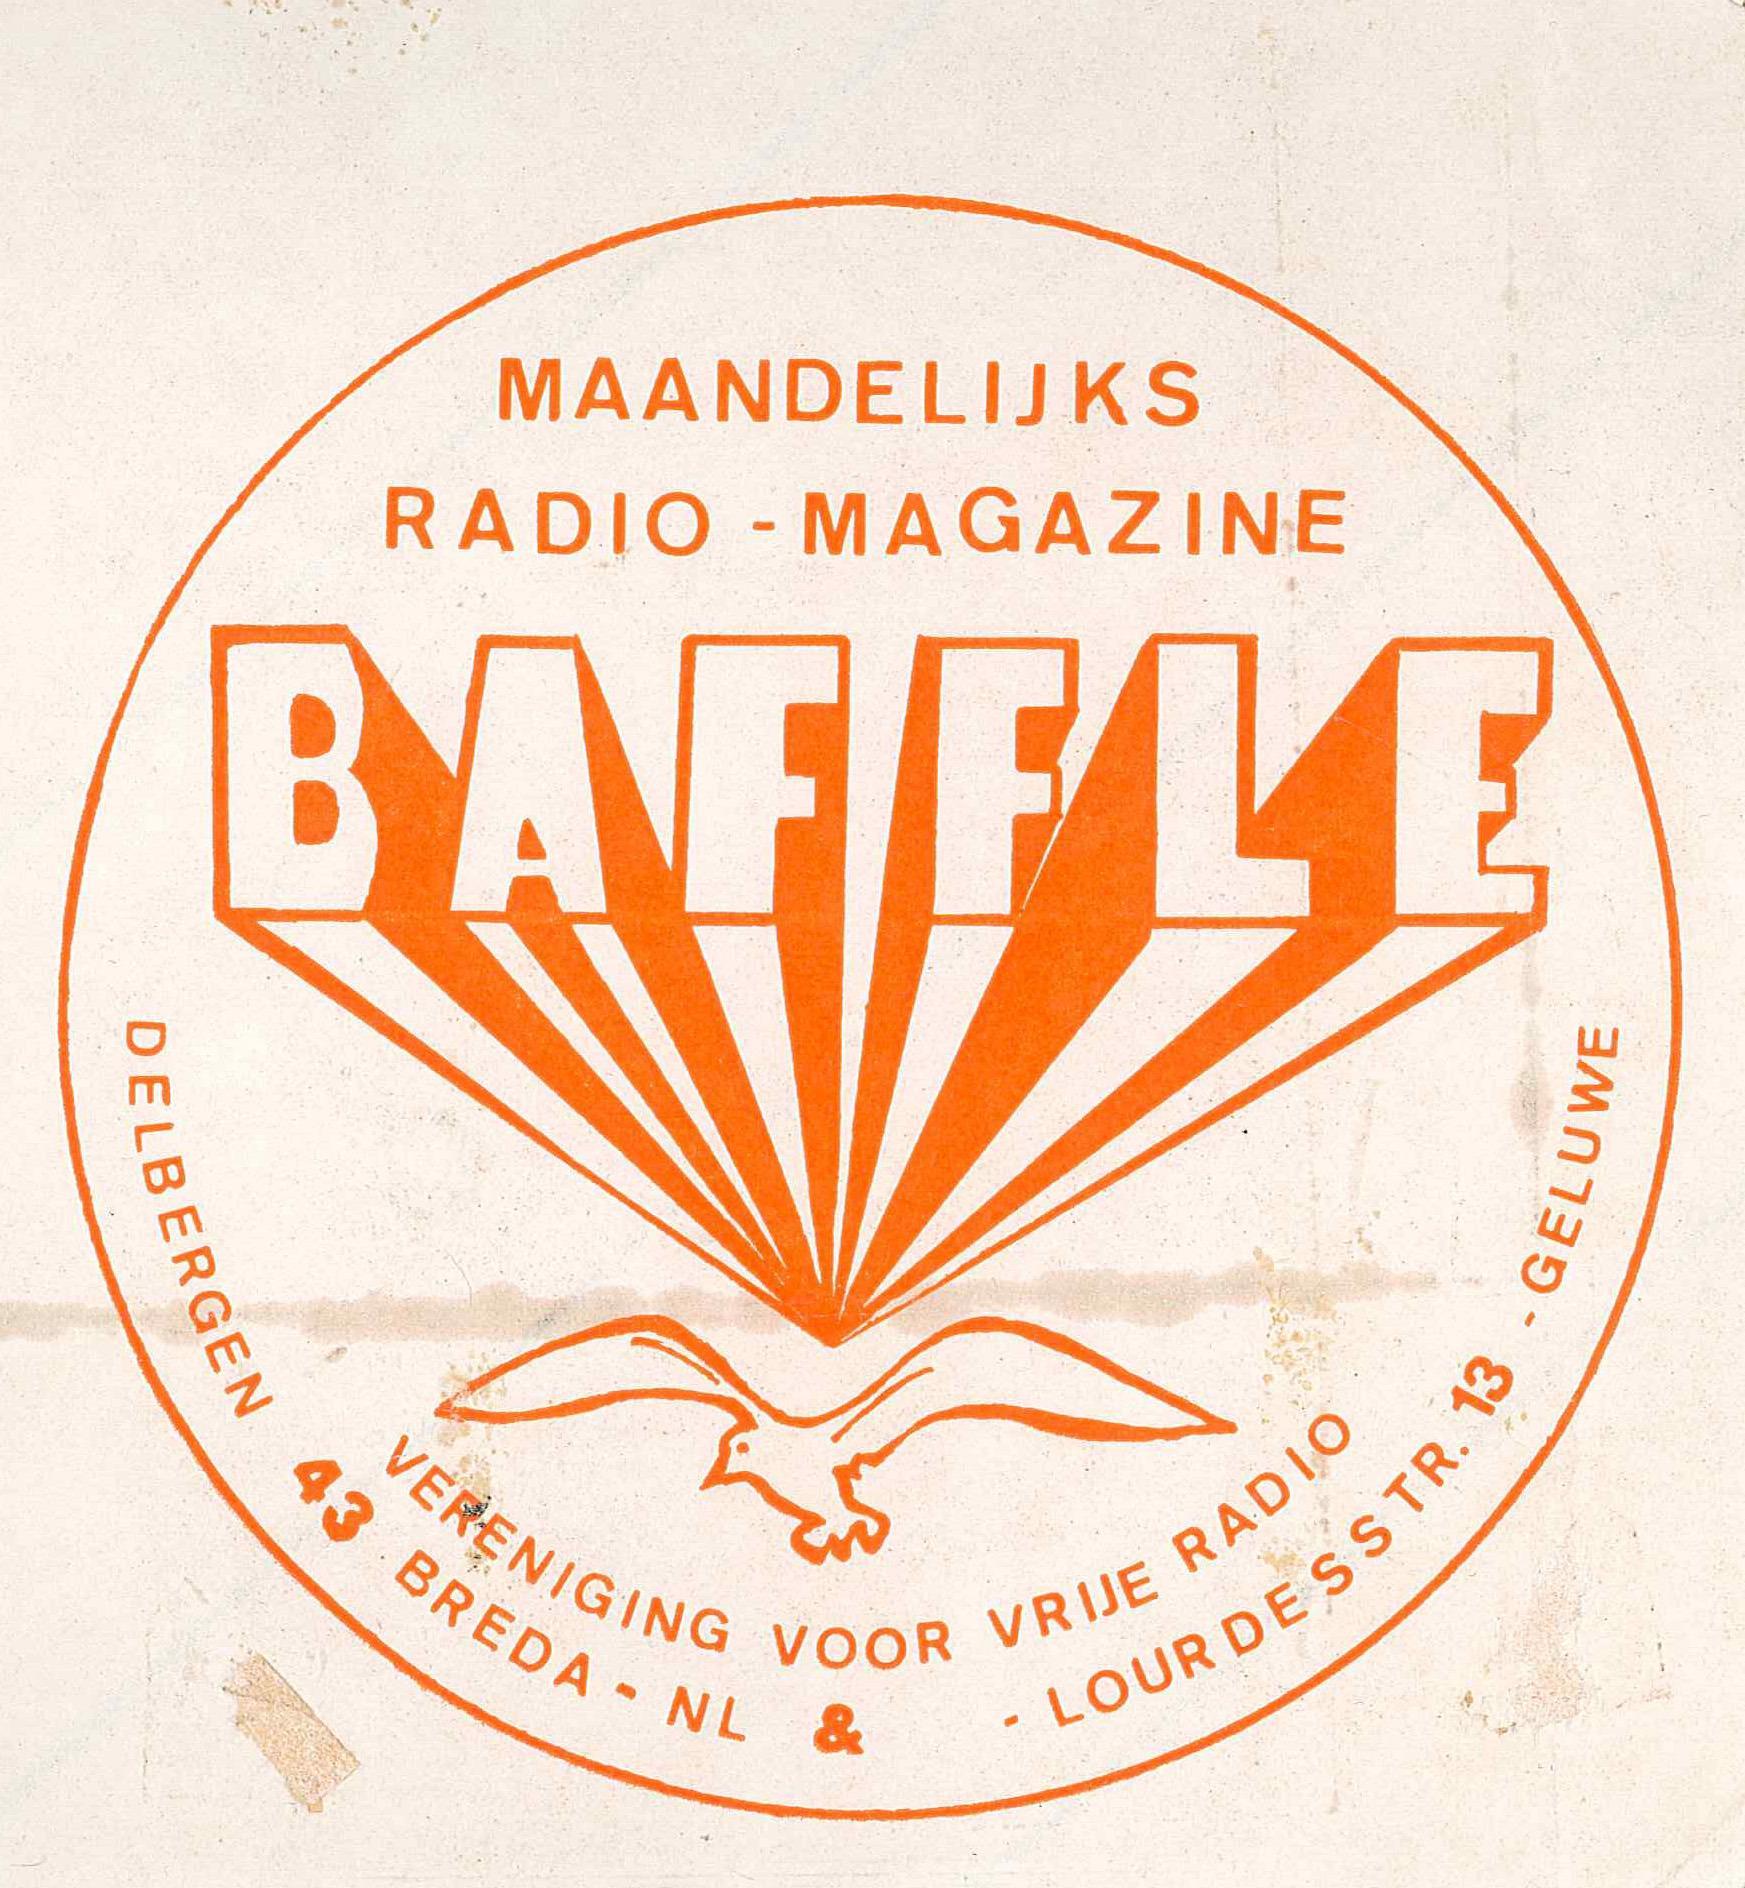 1968 Baffle sticker.jpg